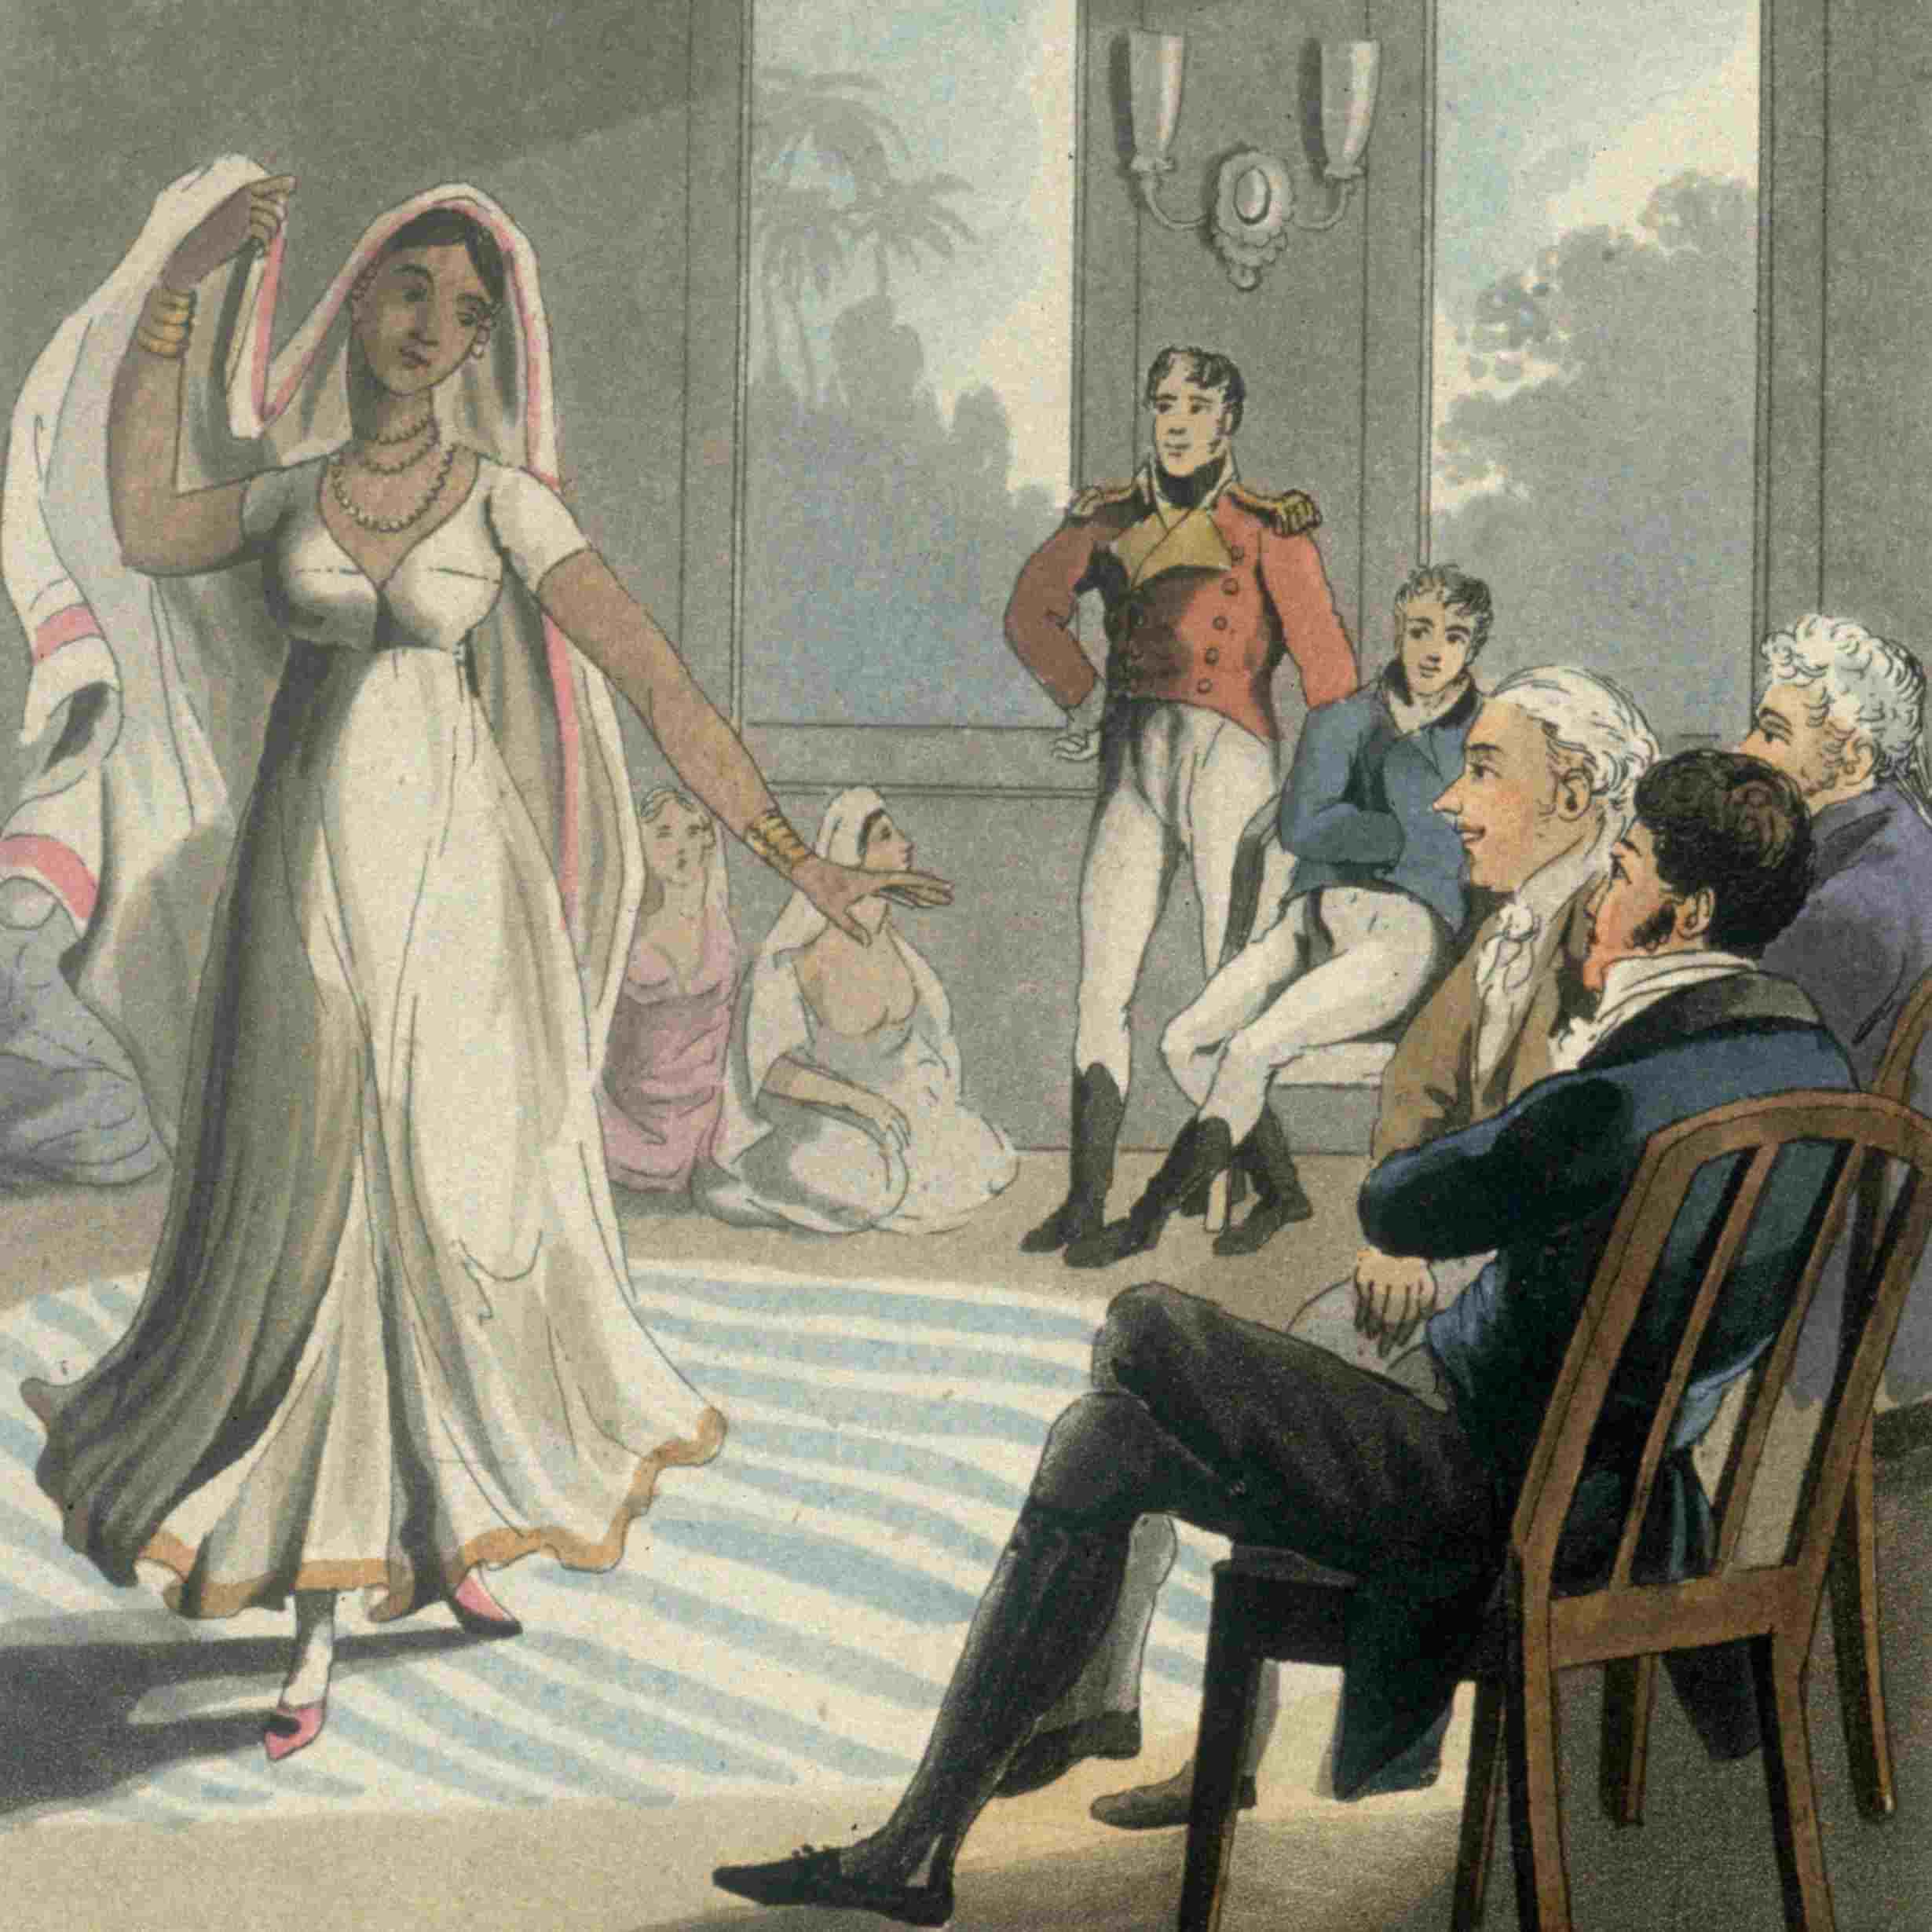 A dancing woman entertaining Europeans